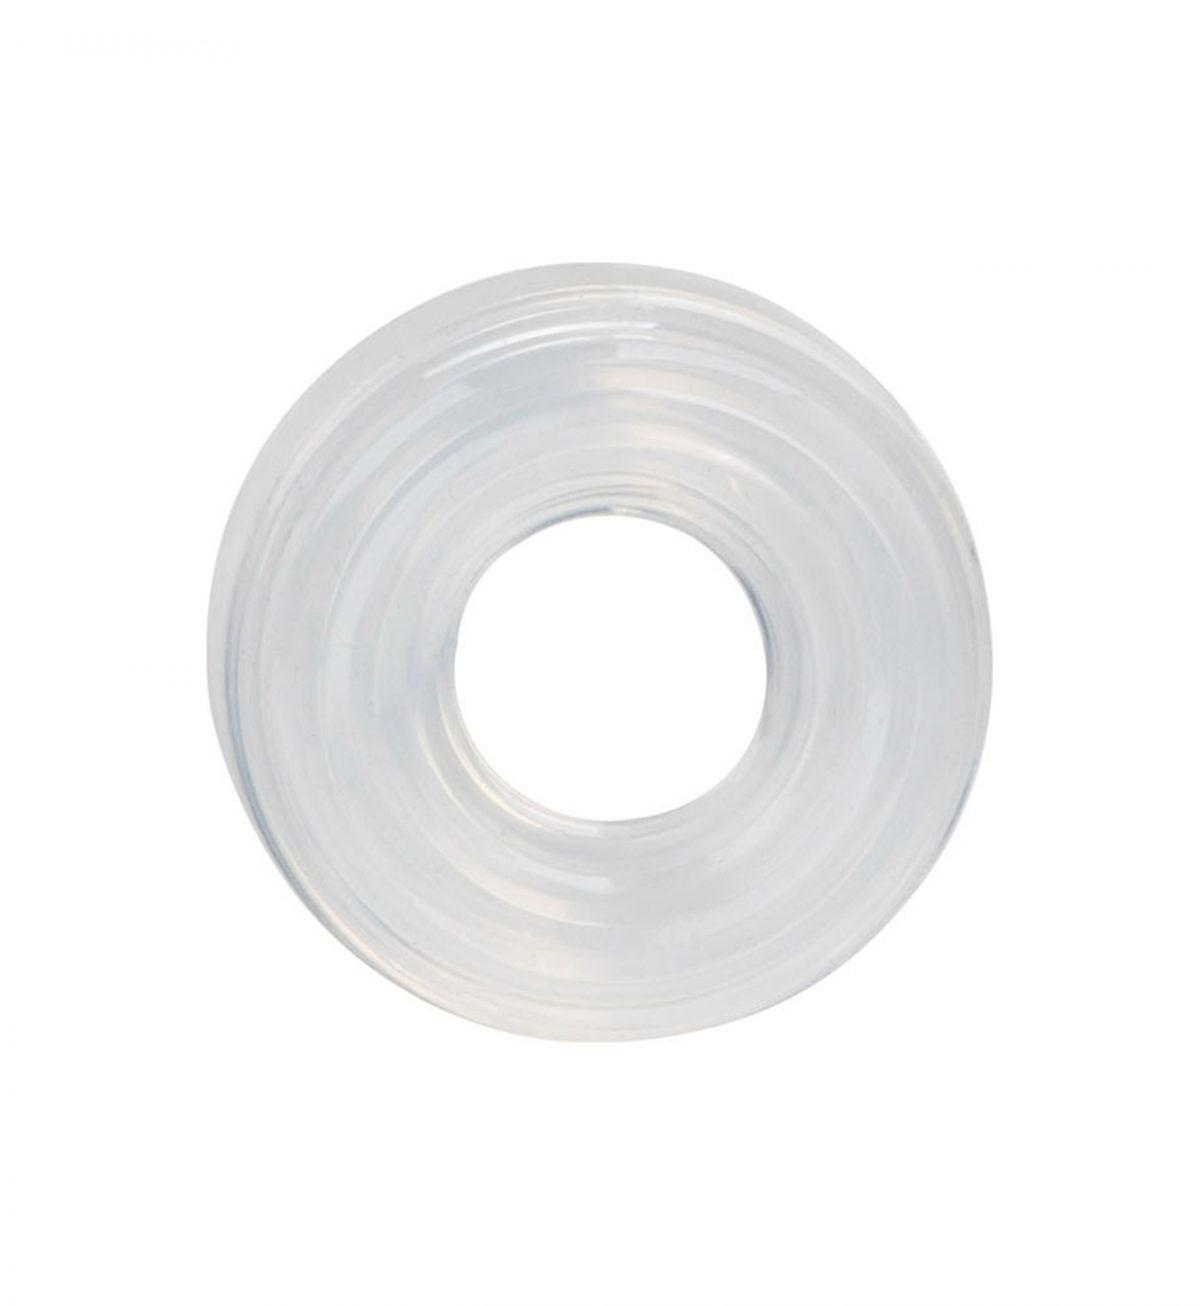 Premium Silicone Ring Medium - Penisring i 100 % silikon - CalExotics